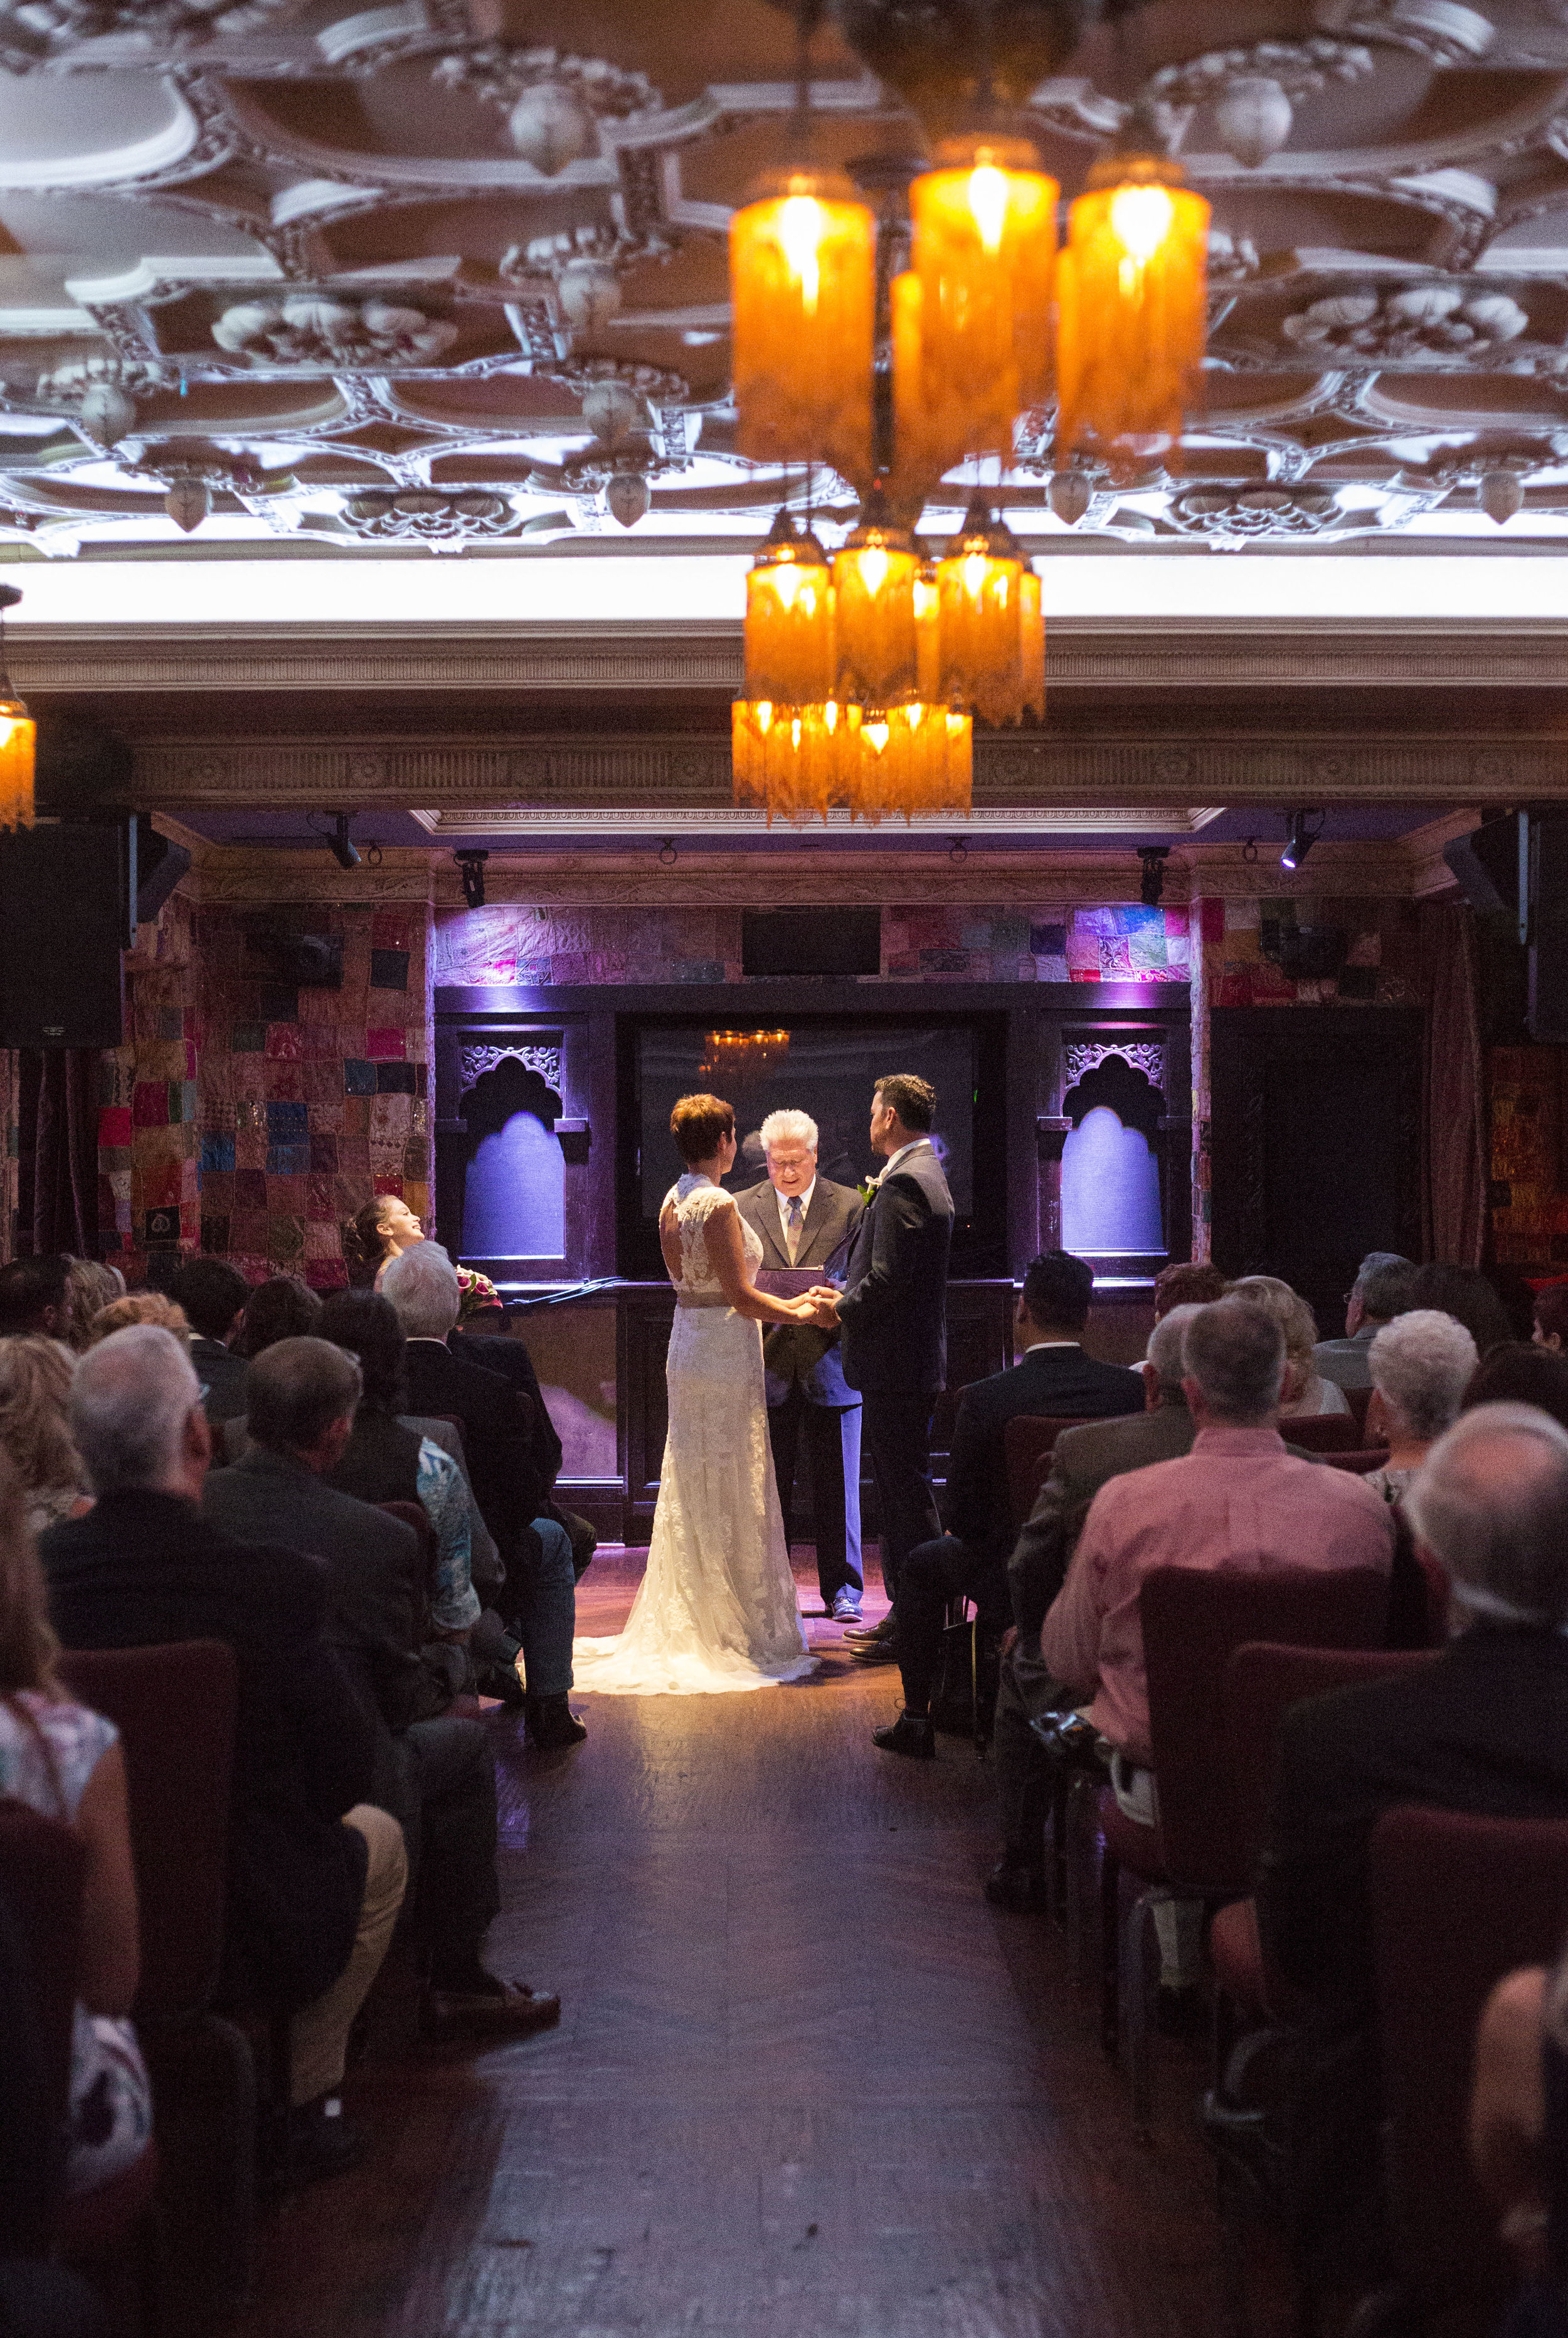 ATGI_Kat and Gabe Wedding 2016_2S8A5321.jpg